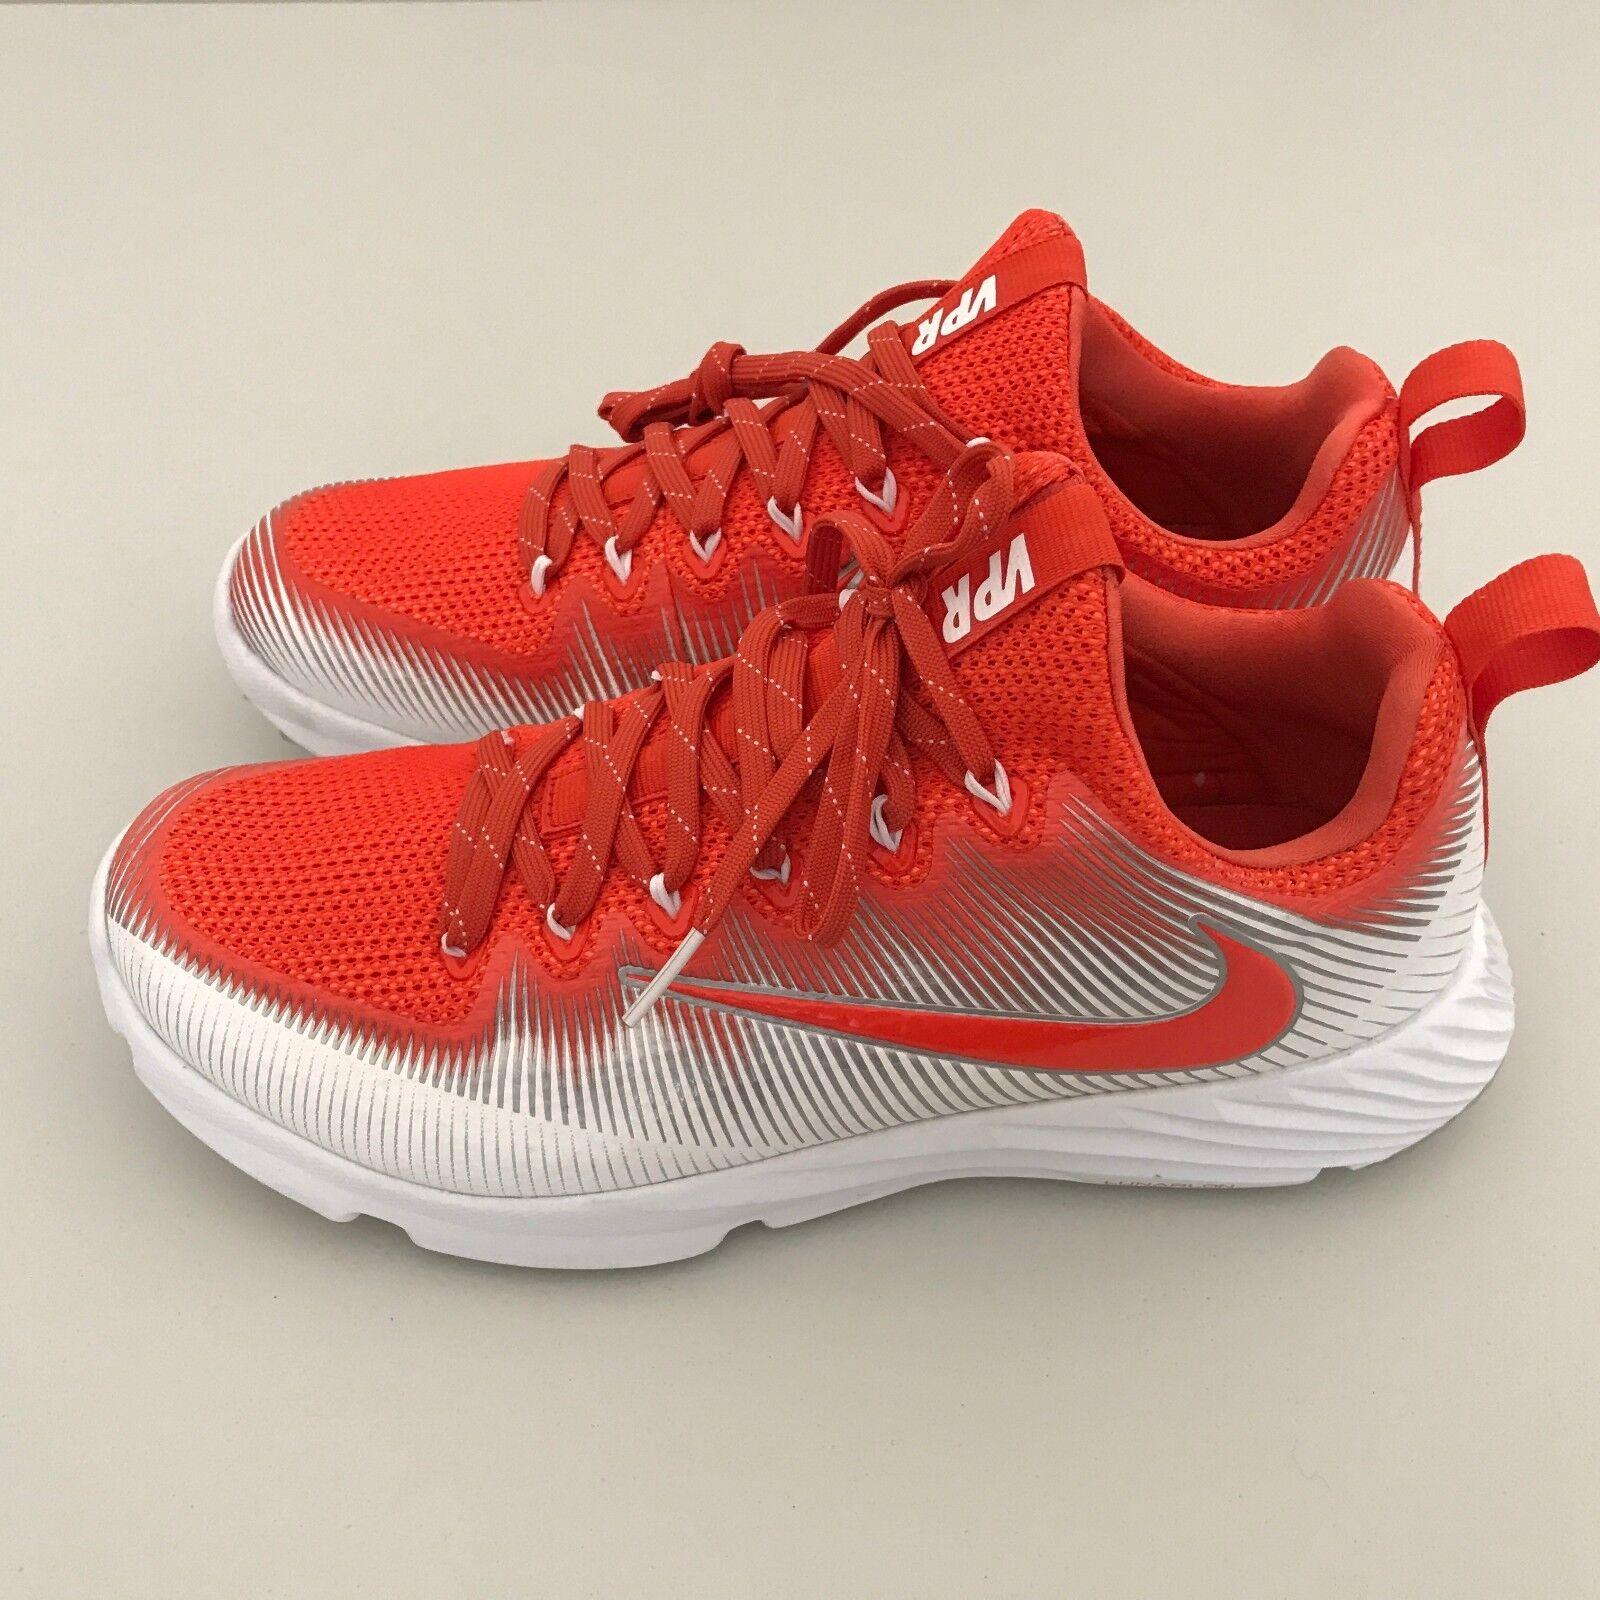 Nike Mens Vapor Speed Turf LAX Football Trainers White orange Sz 8 (848334-881)